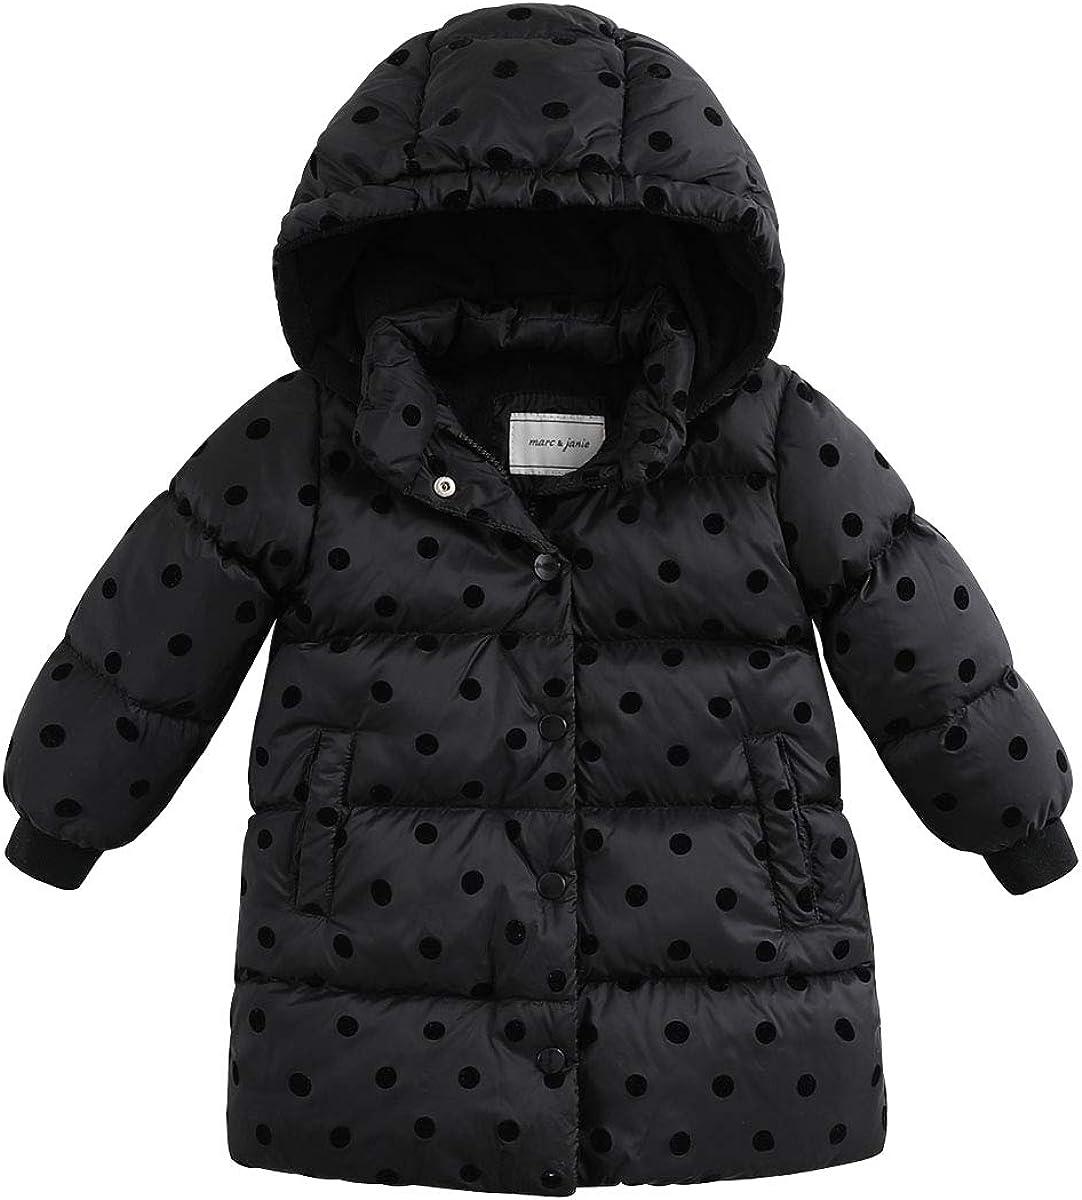 marc janie Girls Light Weight Long Down Jacket Packable Hooded Puffer Down Coat